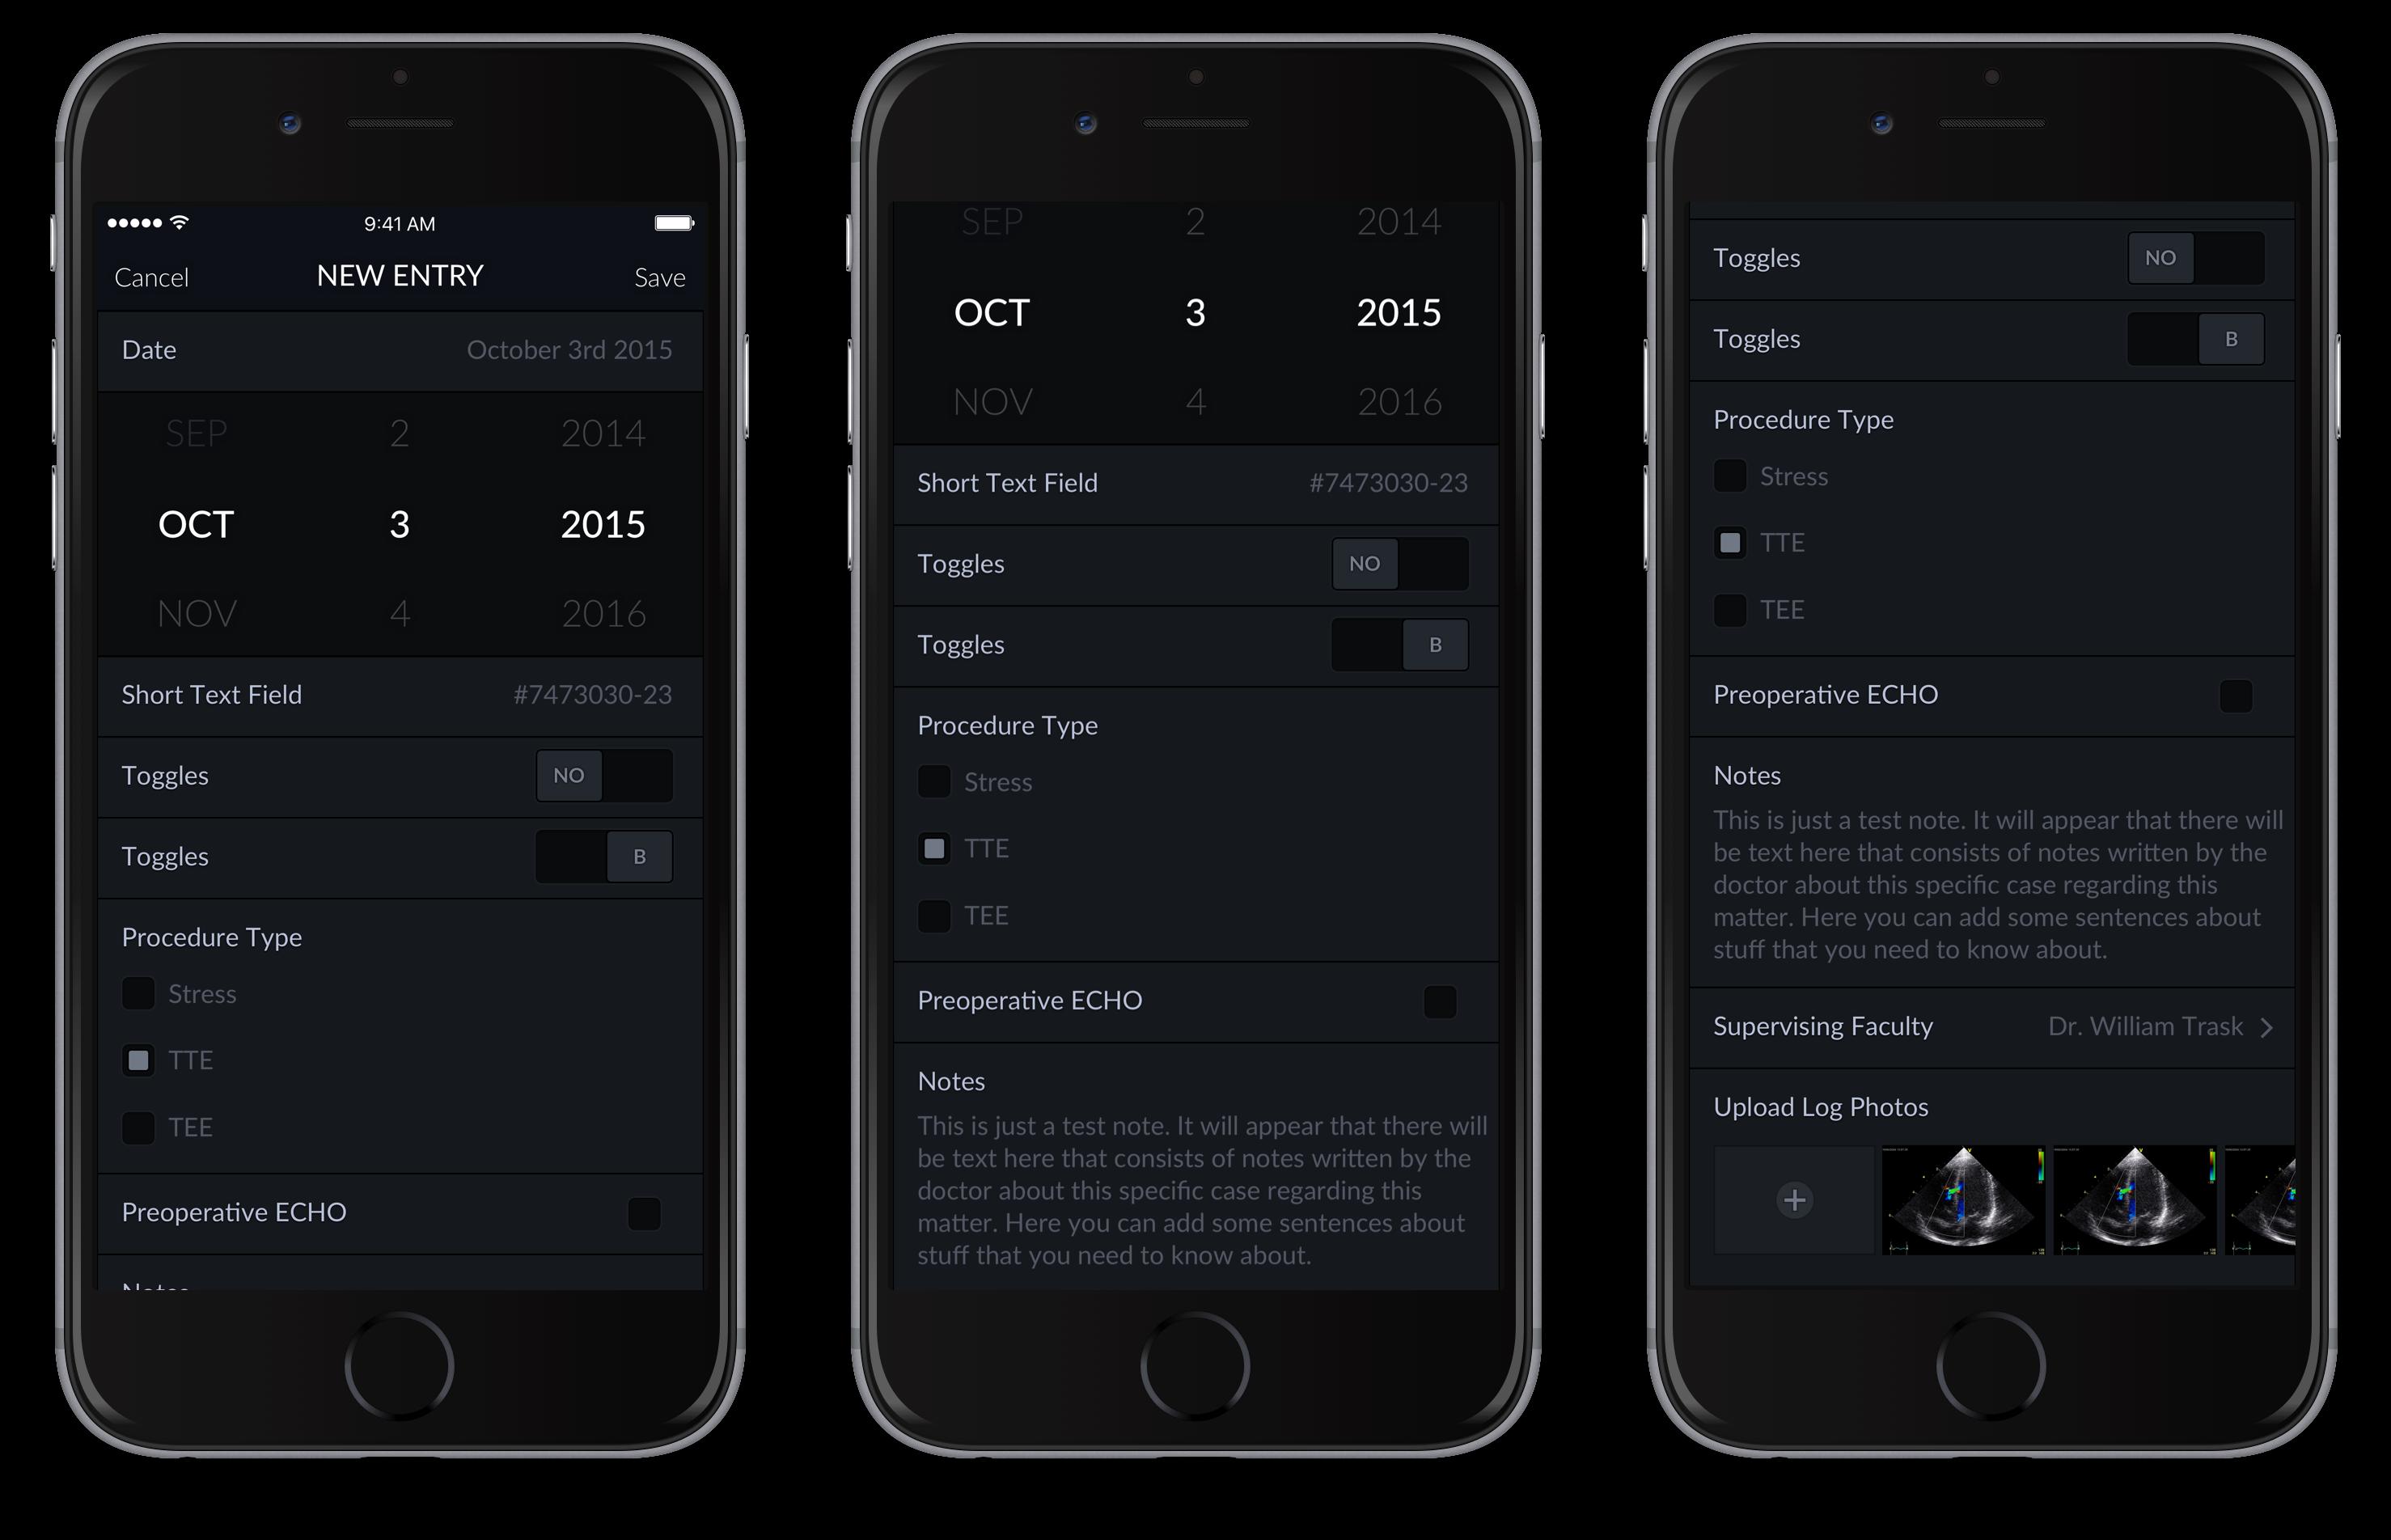 Echo Logs – iPhone 5